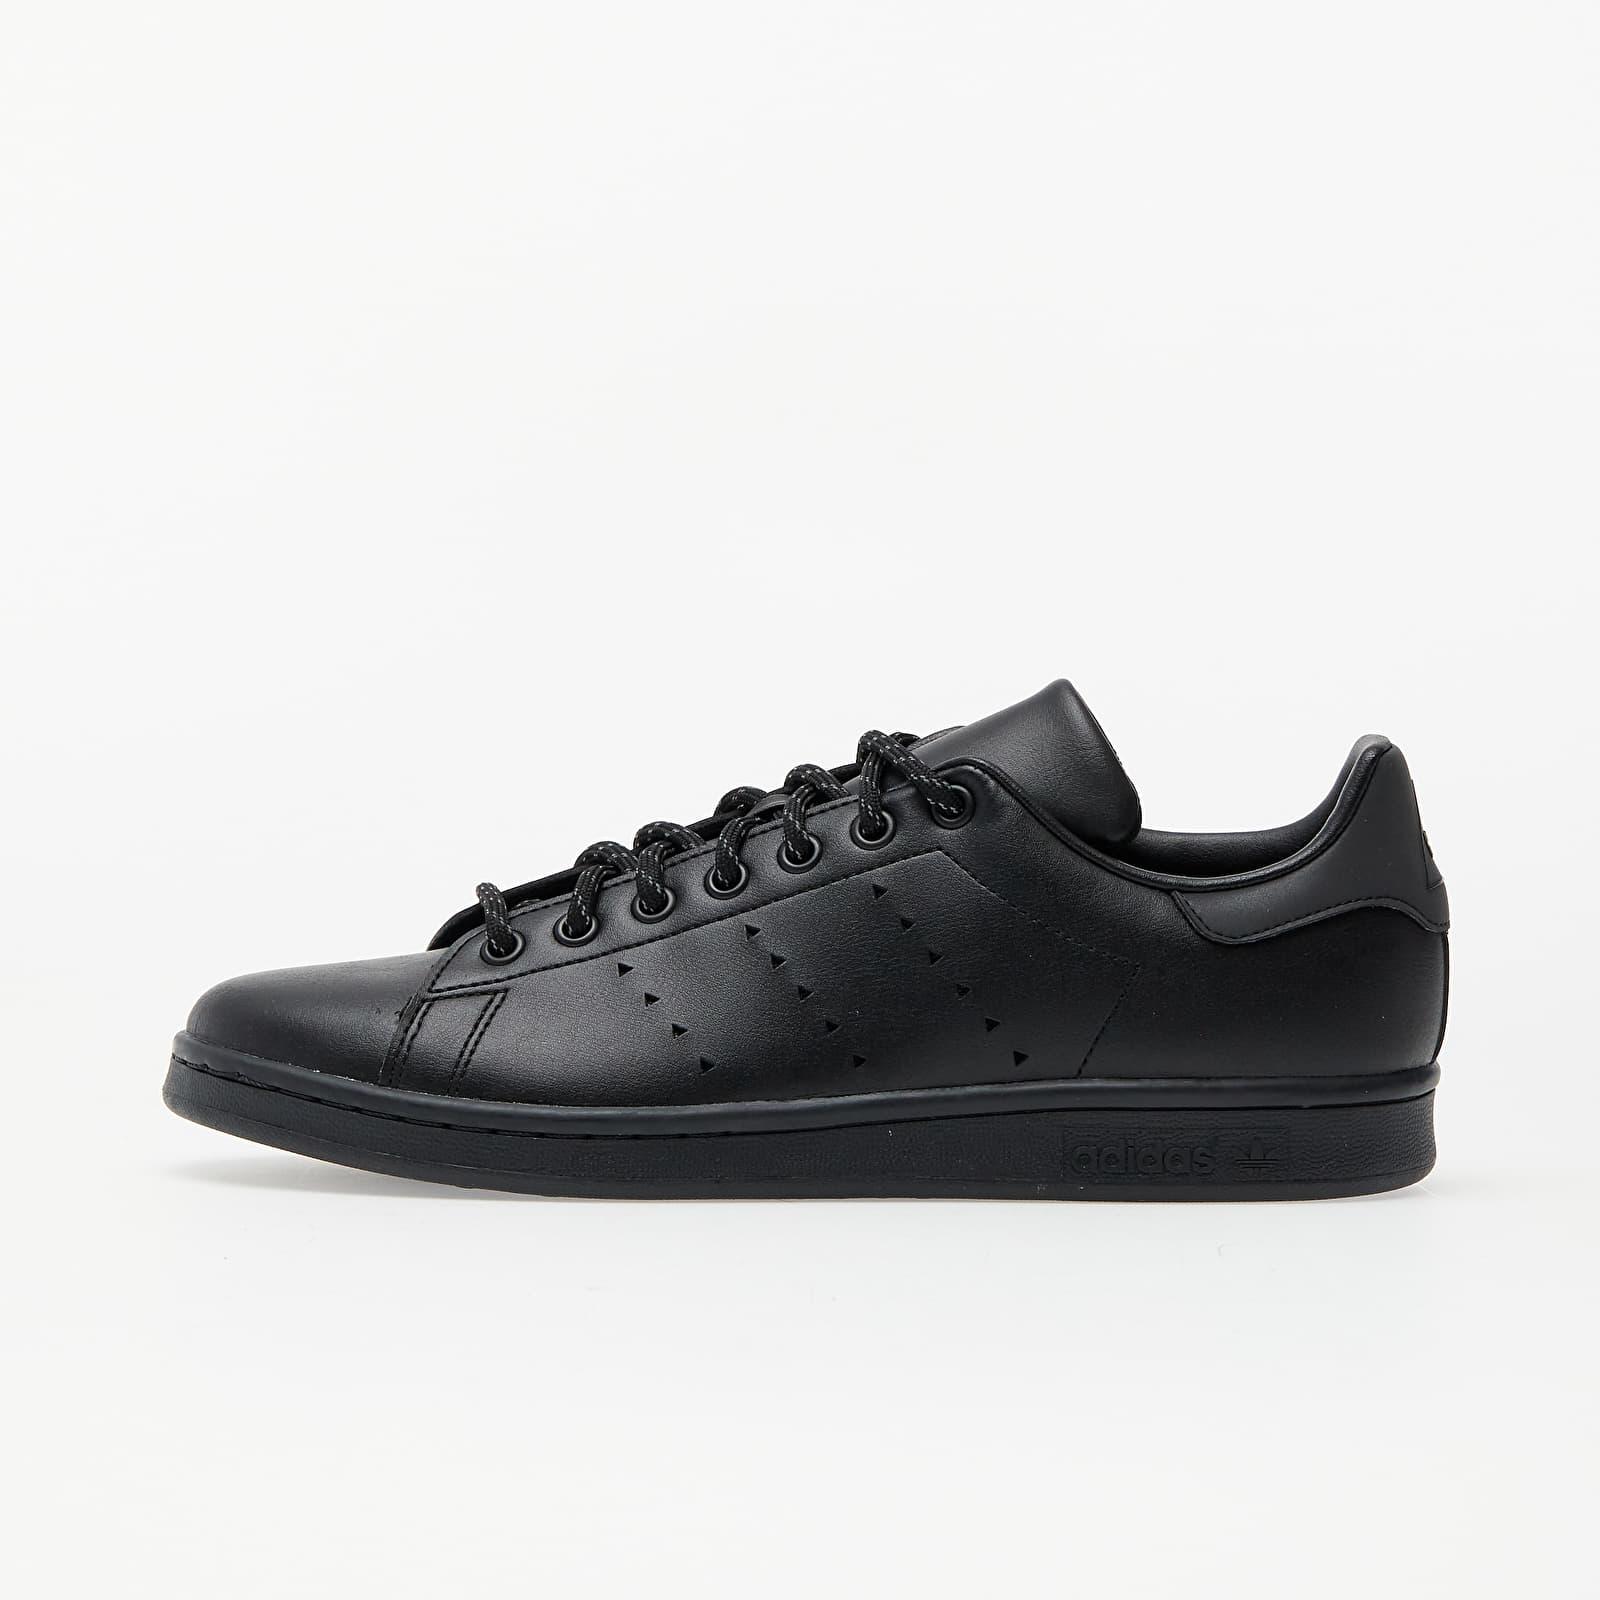 Мужская обувь adidas x Pharrell Williams Stan Smith Core Black/ Core Black/ Core Black